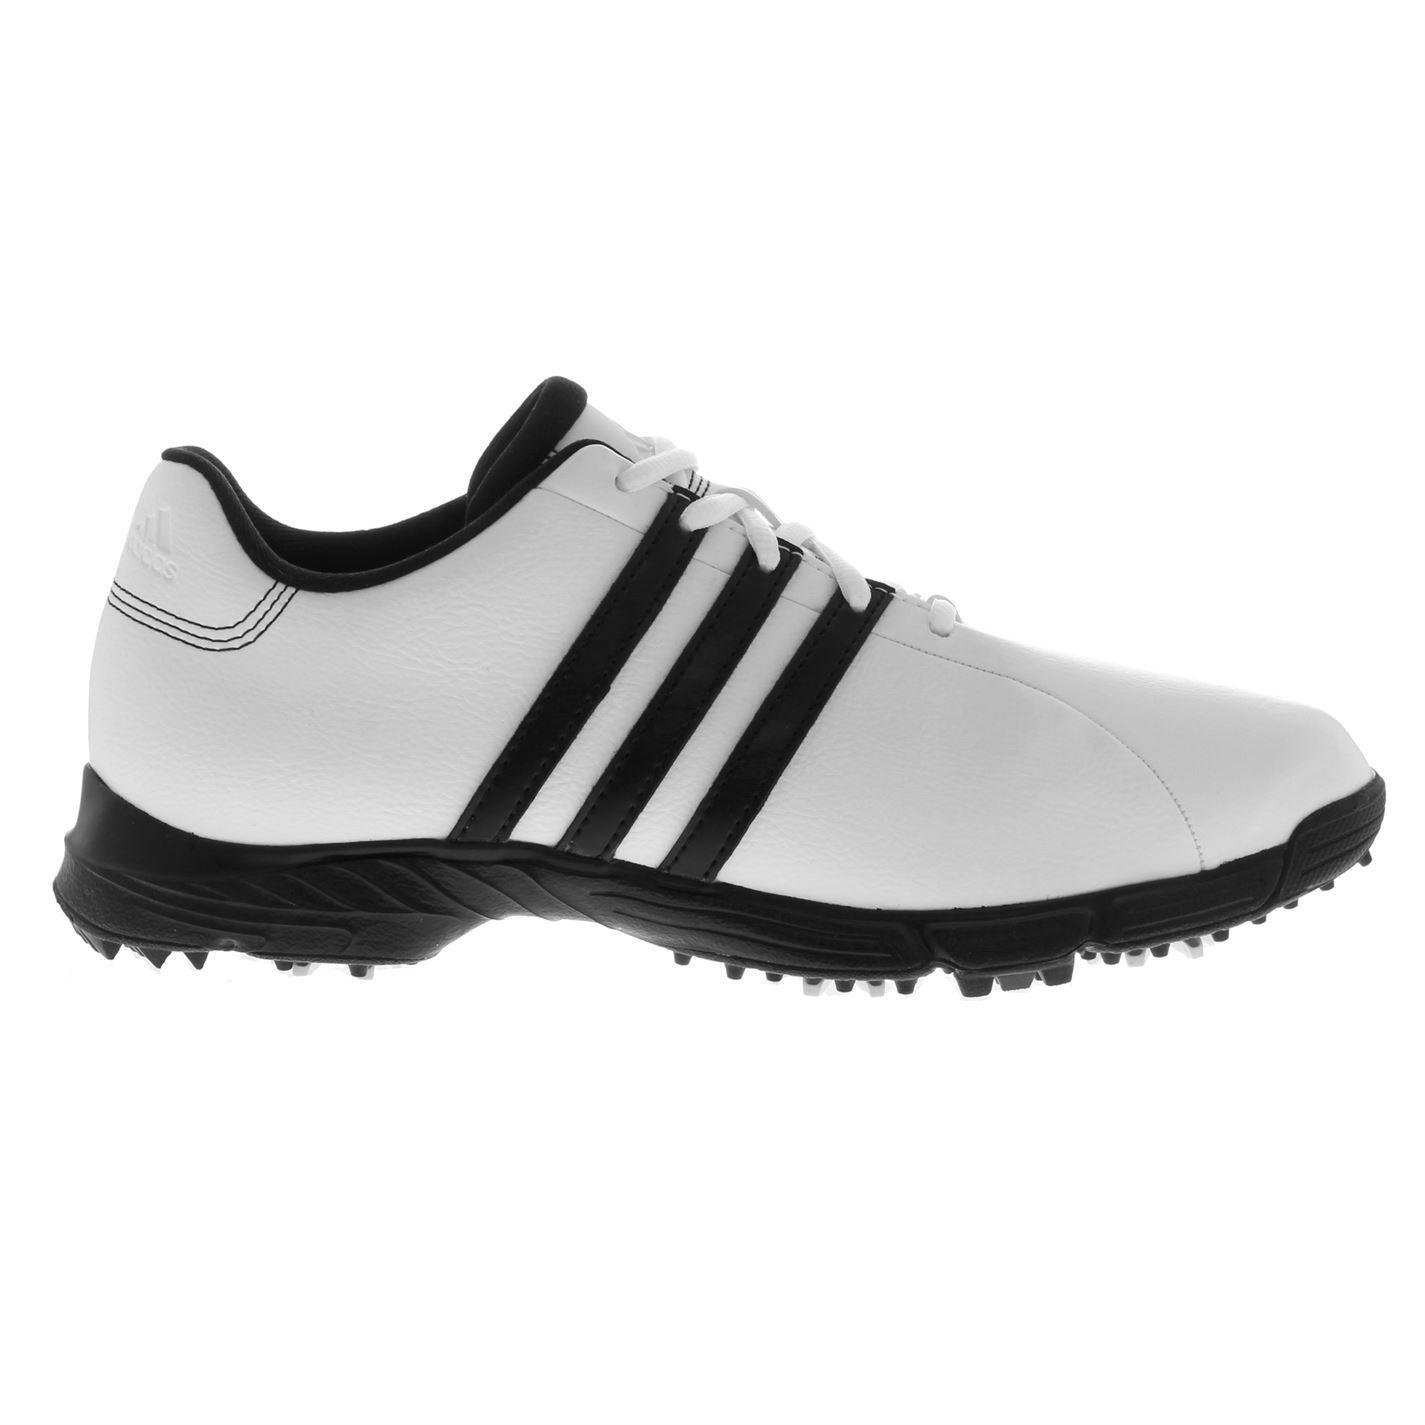 adidas-Golflite-Golf-Shoes-Mens-Spikes-Footwear thumbnail 17